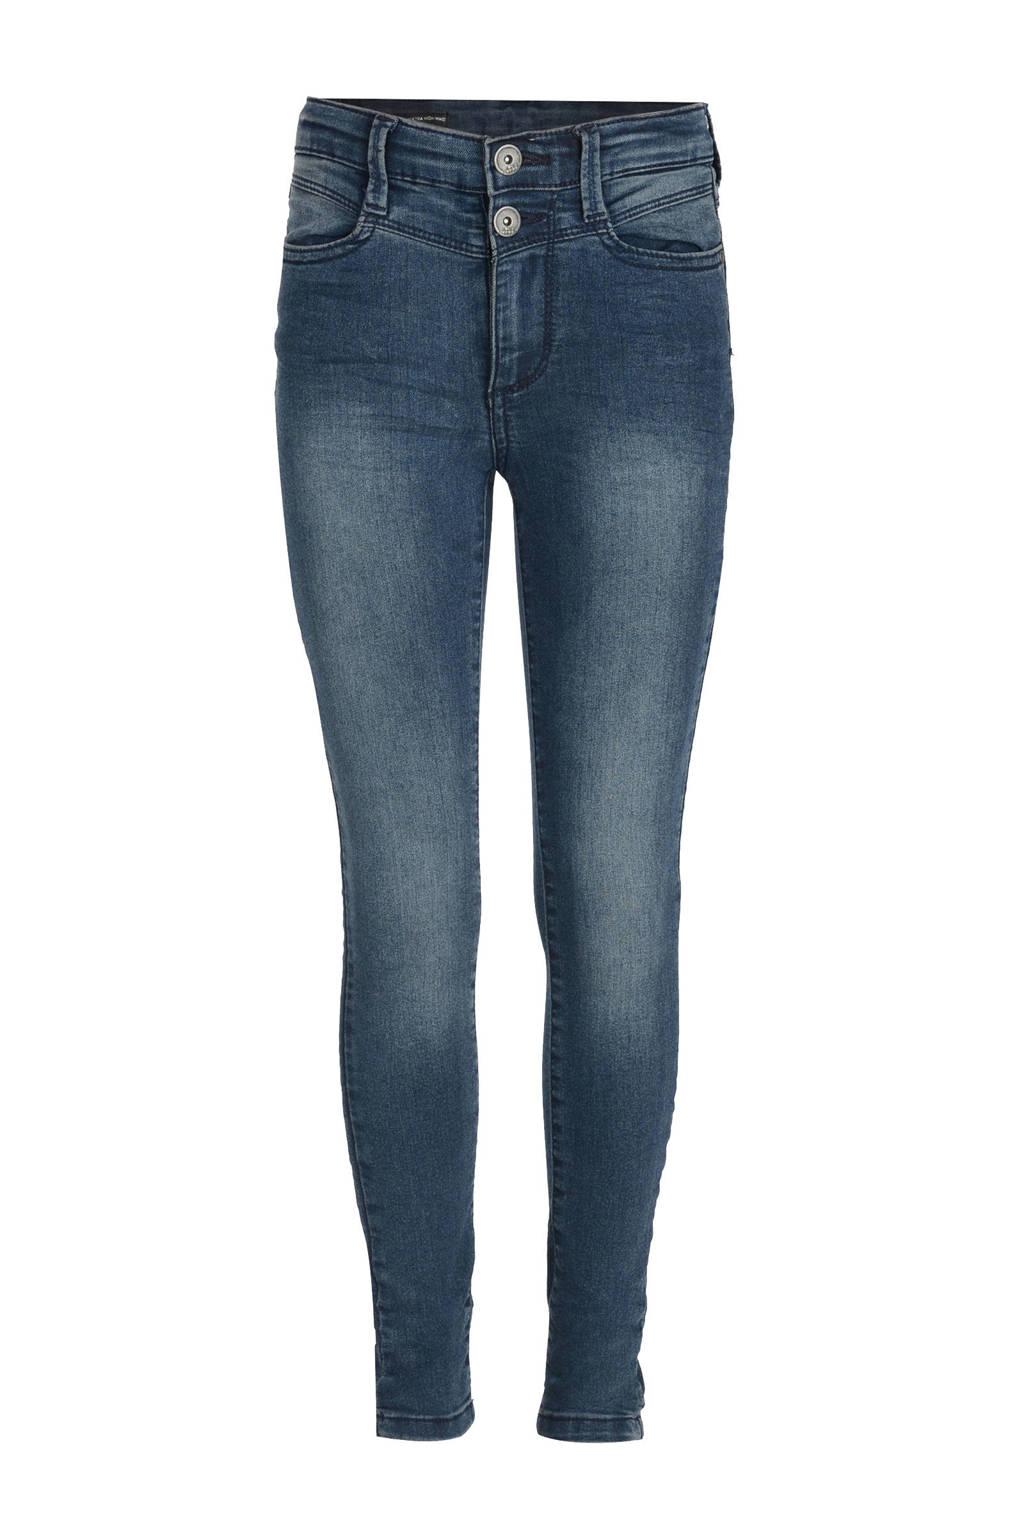 Jill & Mitch by Shoeby skinny jeans Chrissy stonewashed, Stonewashed